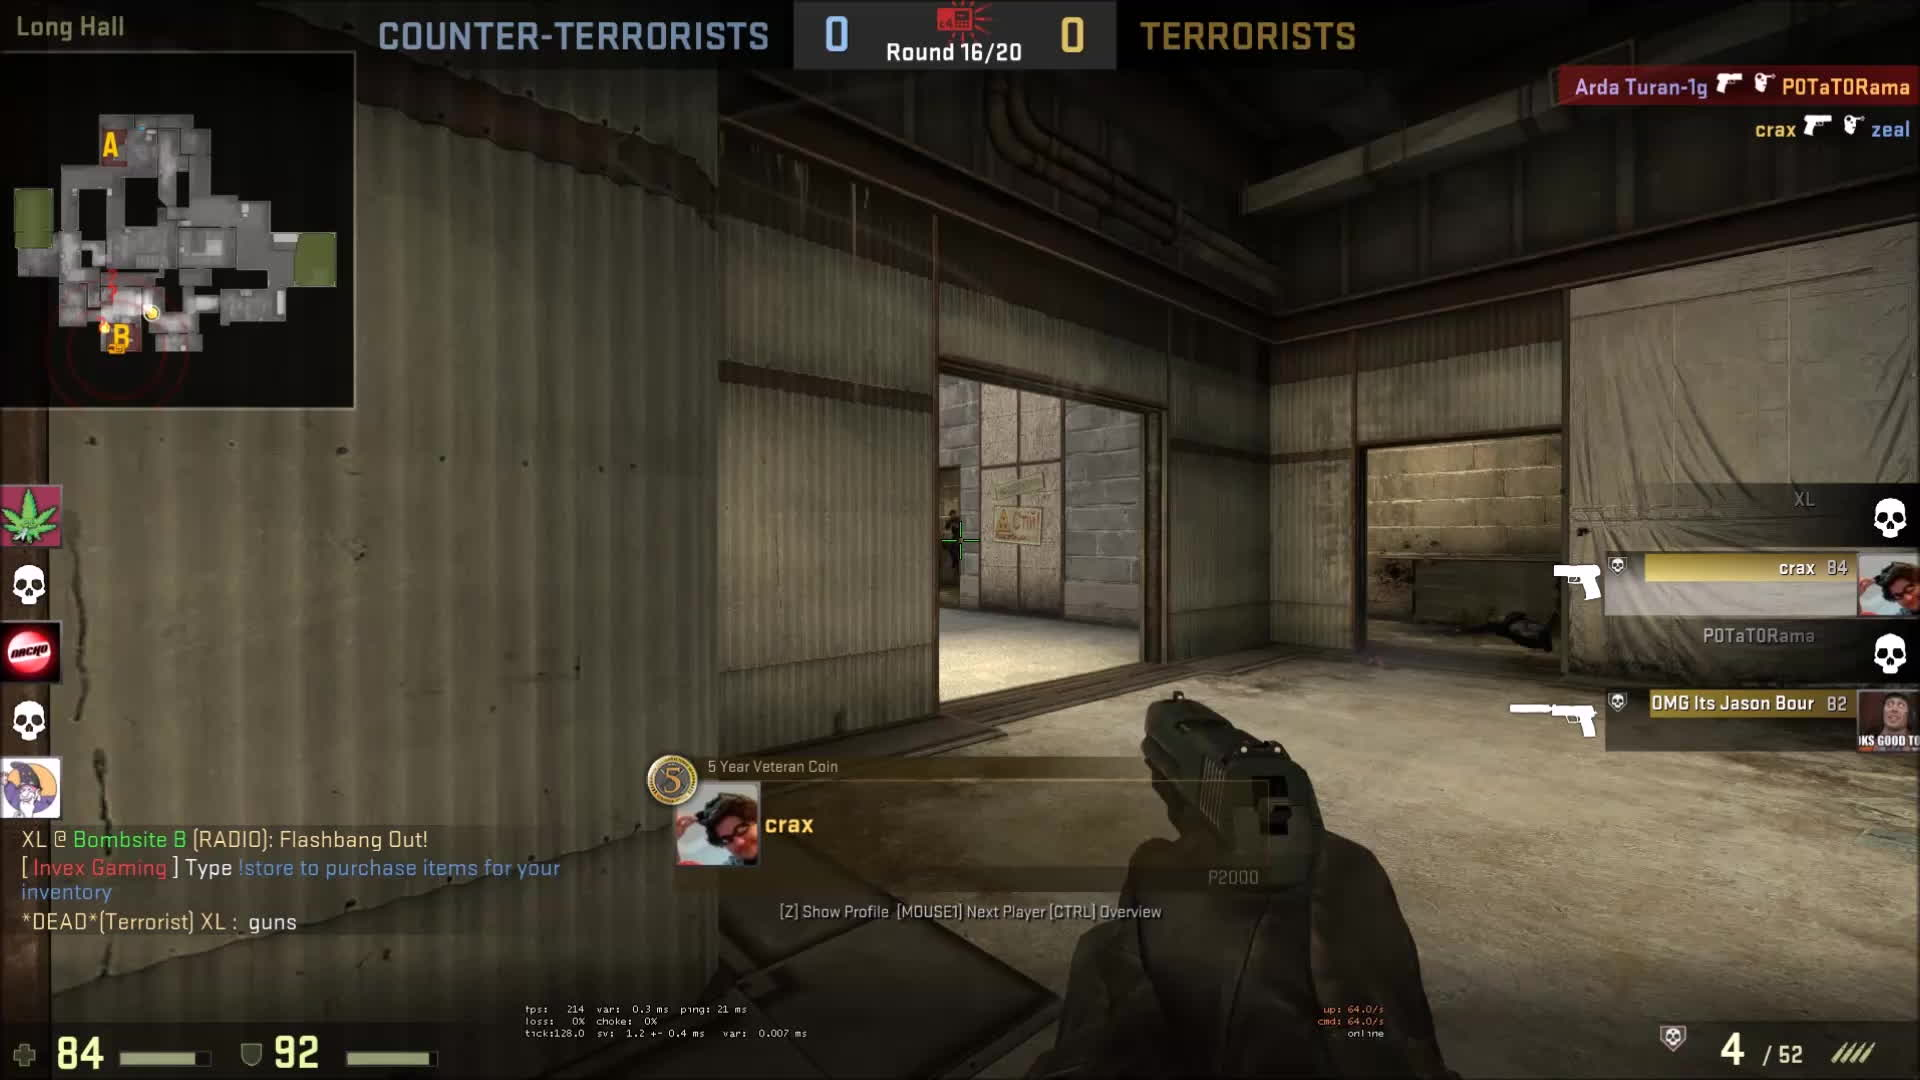 GlobalOffensive, therewasanattempt, Guy on a retakes server gets CSGO'd (reddit) GIFs